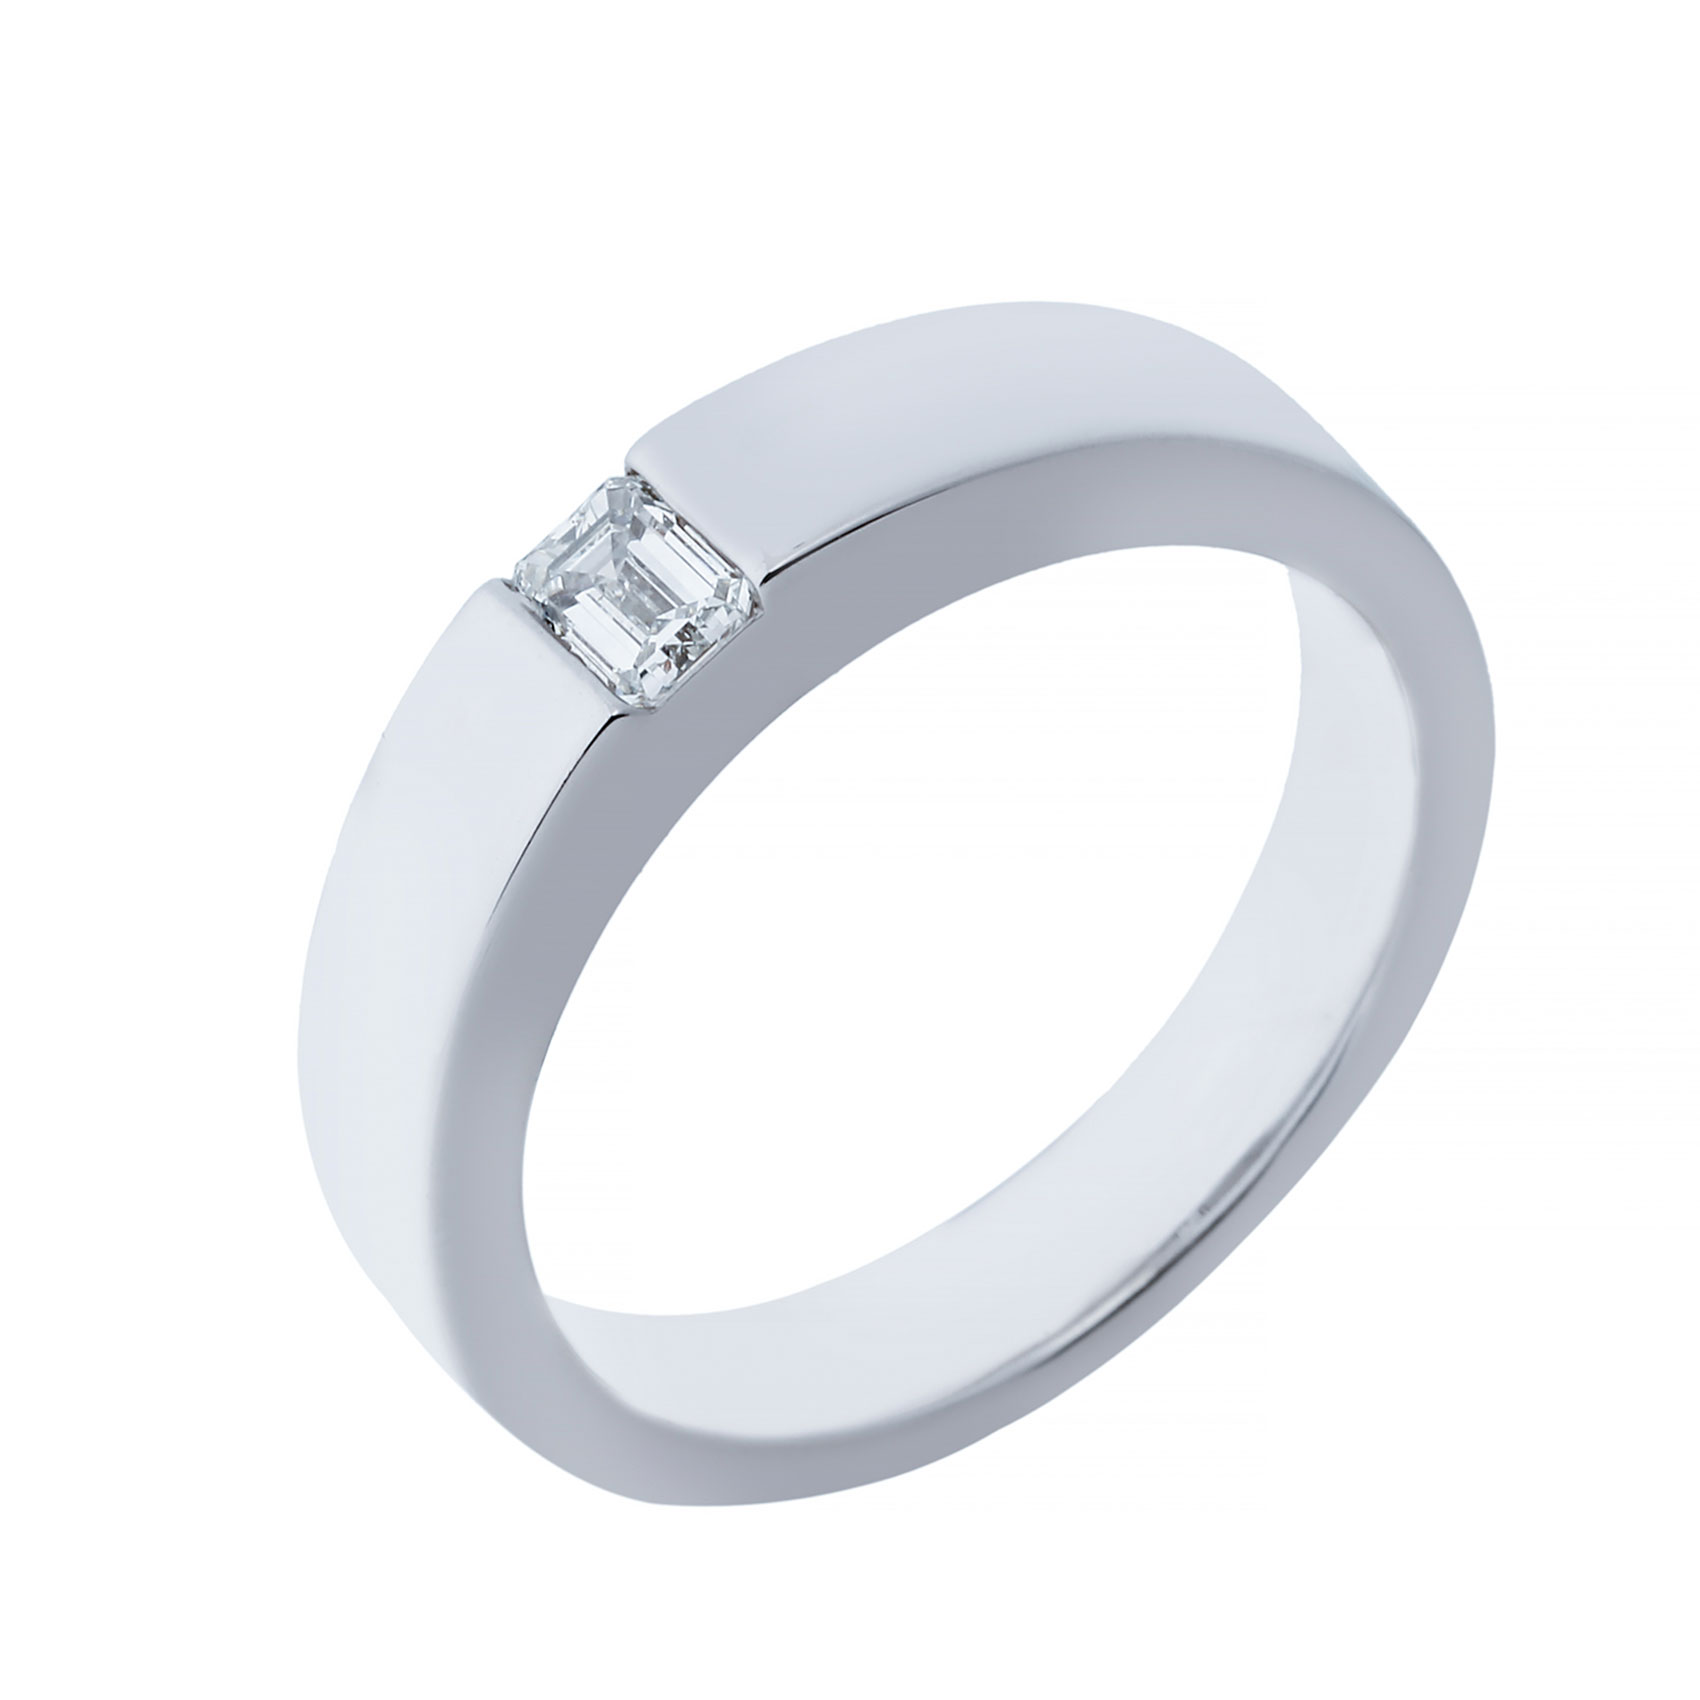 حلقه برليان 80688 A گوهربين goharbin